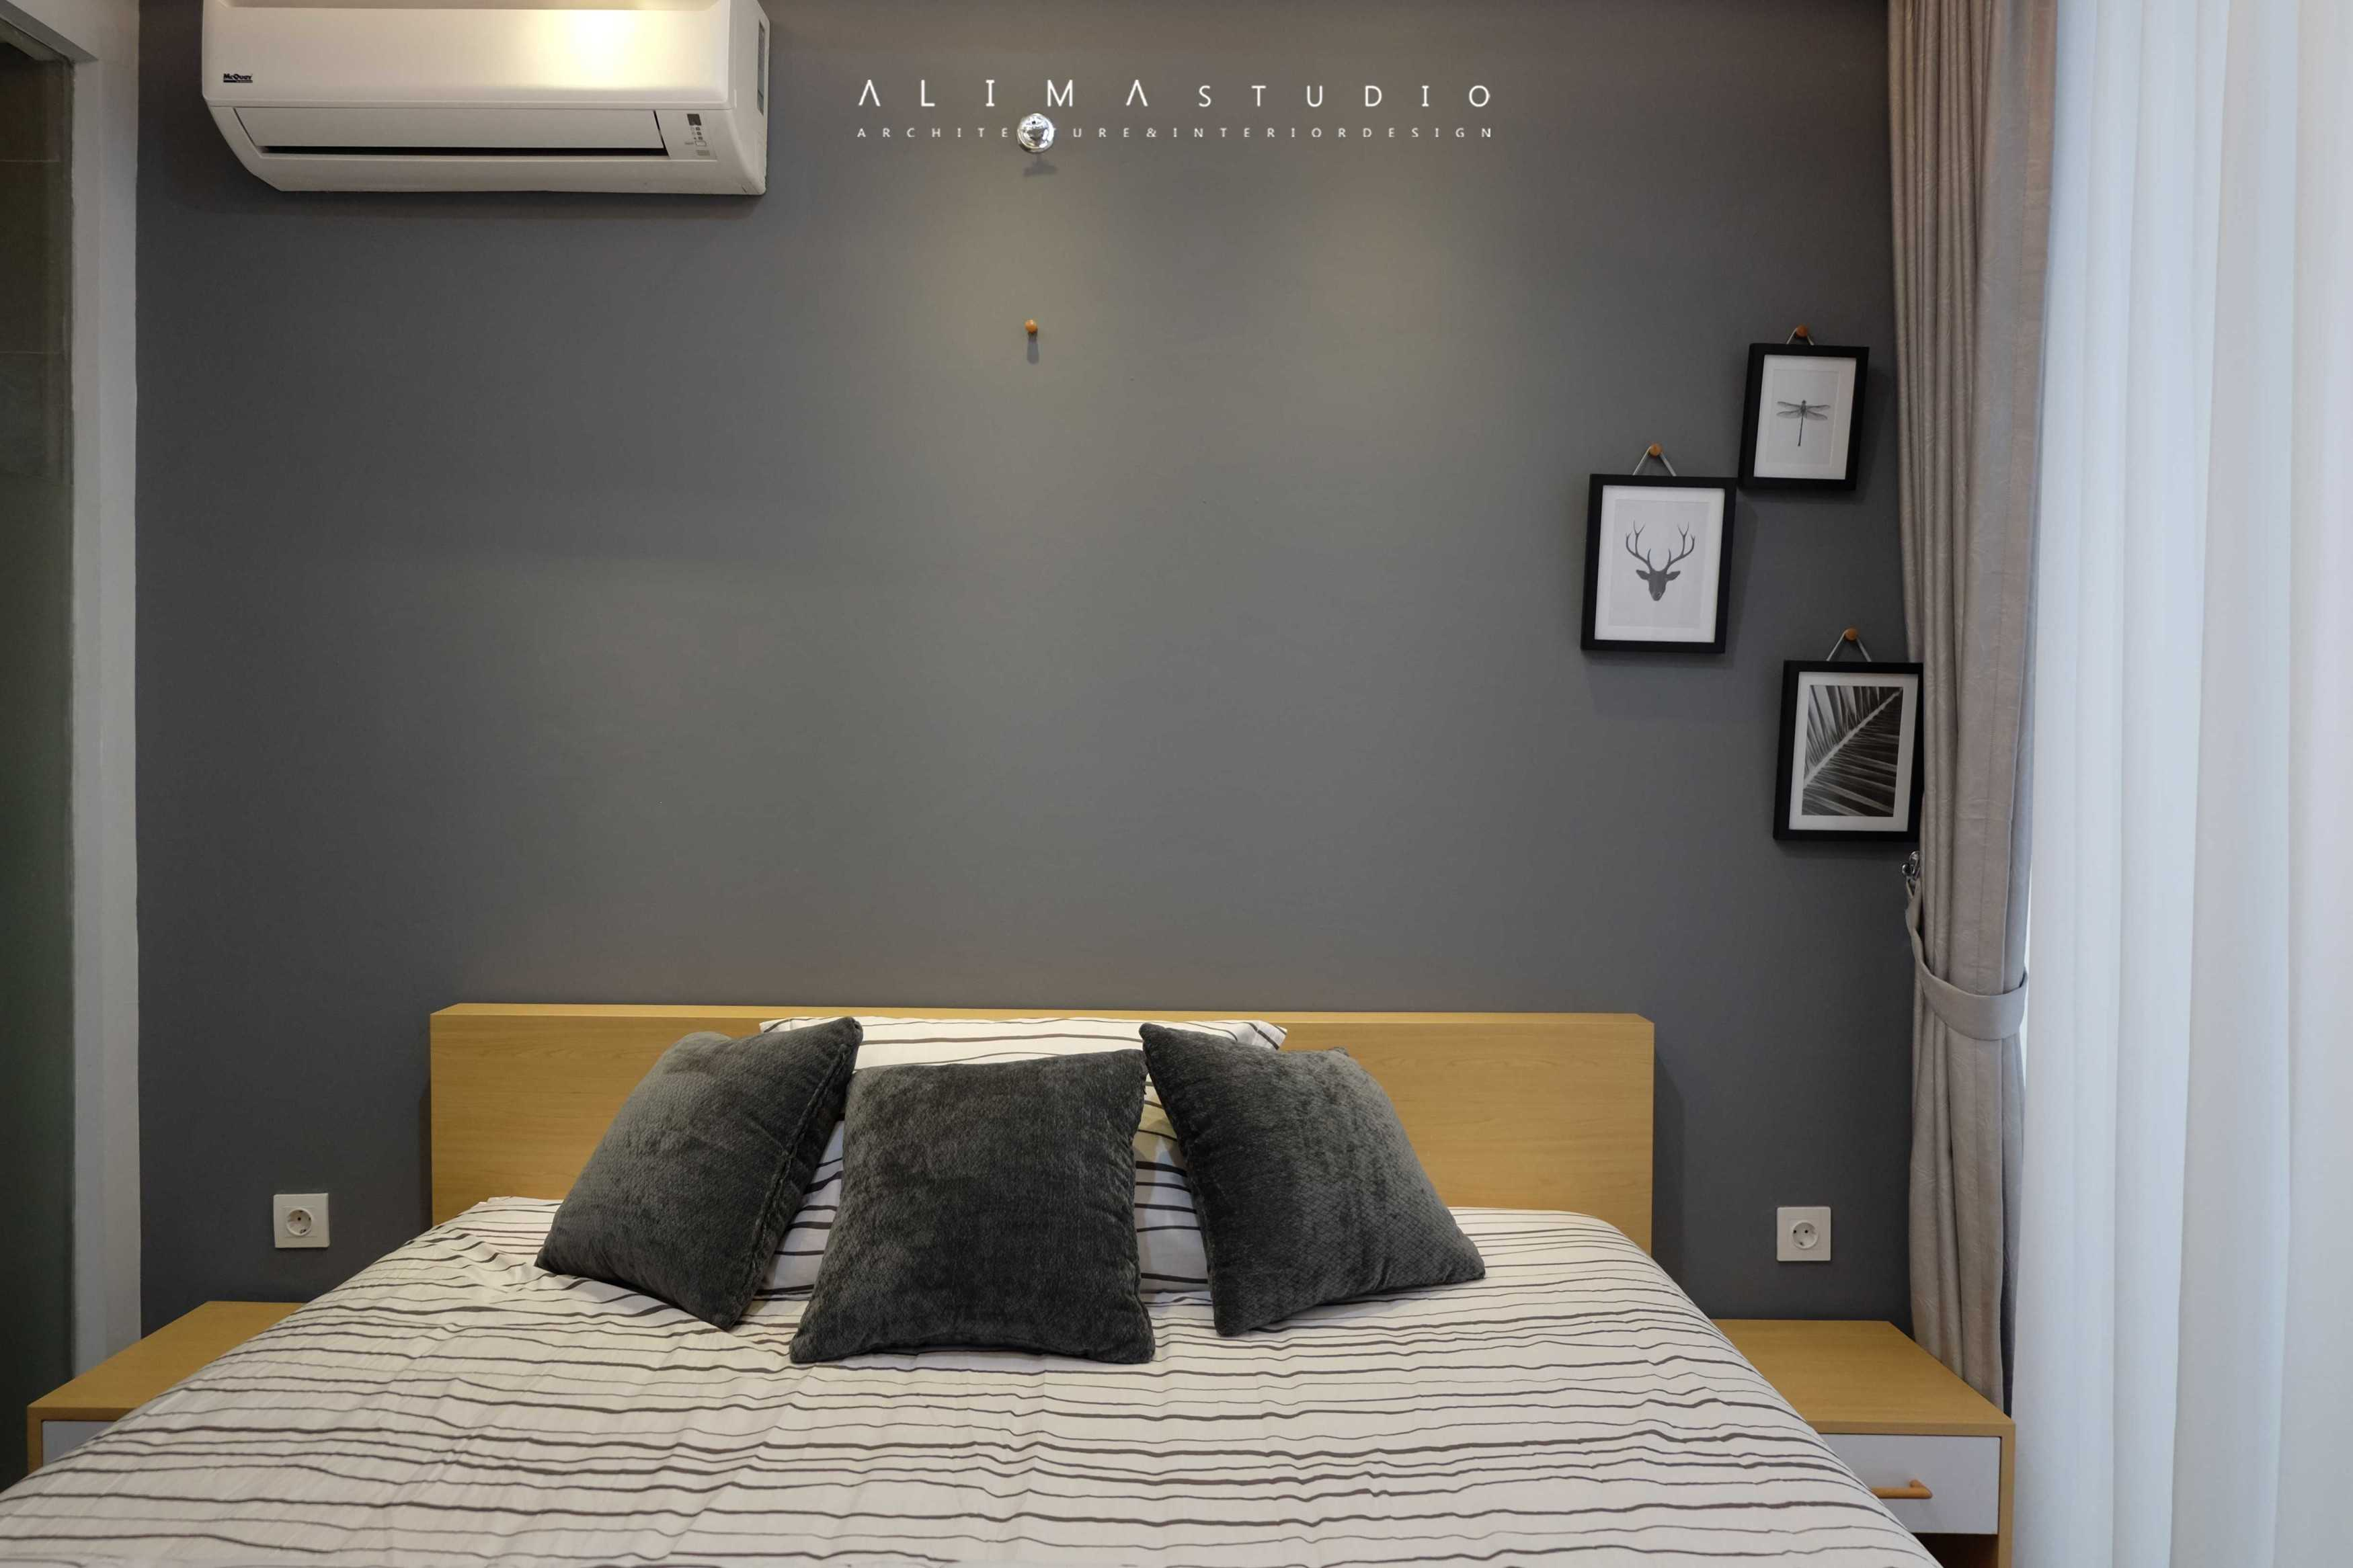 Alima Studio Apartment Satu8 Kedoya Selatan, Jakarta, Indonesia Kedoya Selatan, Jakarta, Indonesia Dscf8094-W Skandinavia  30636